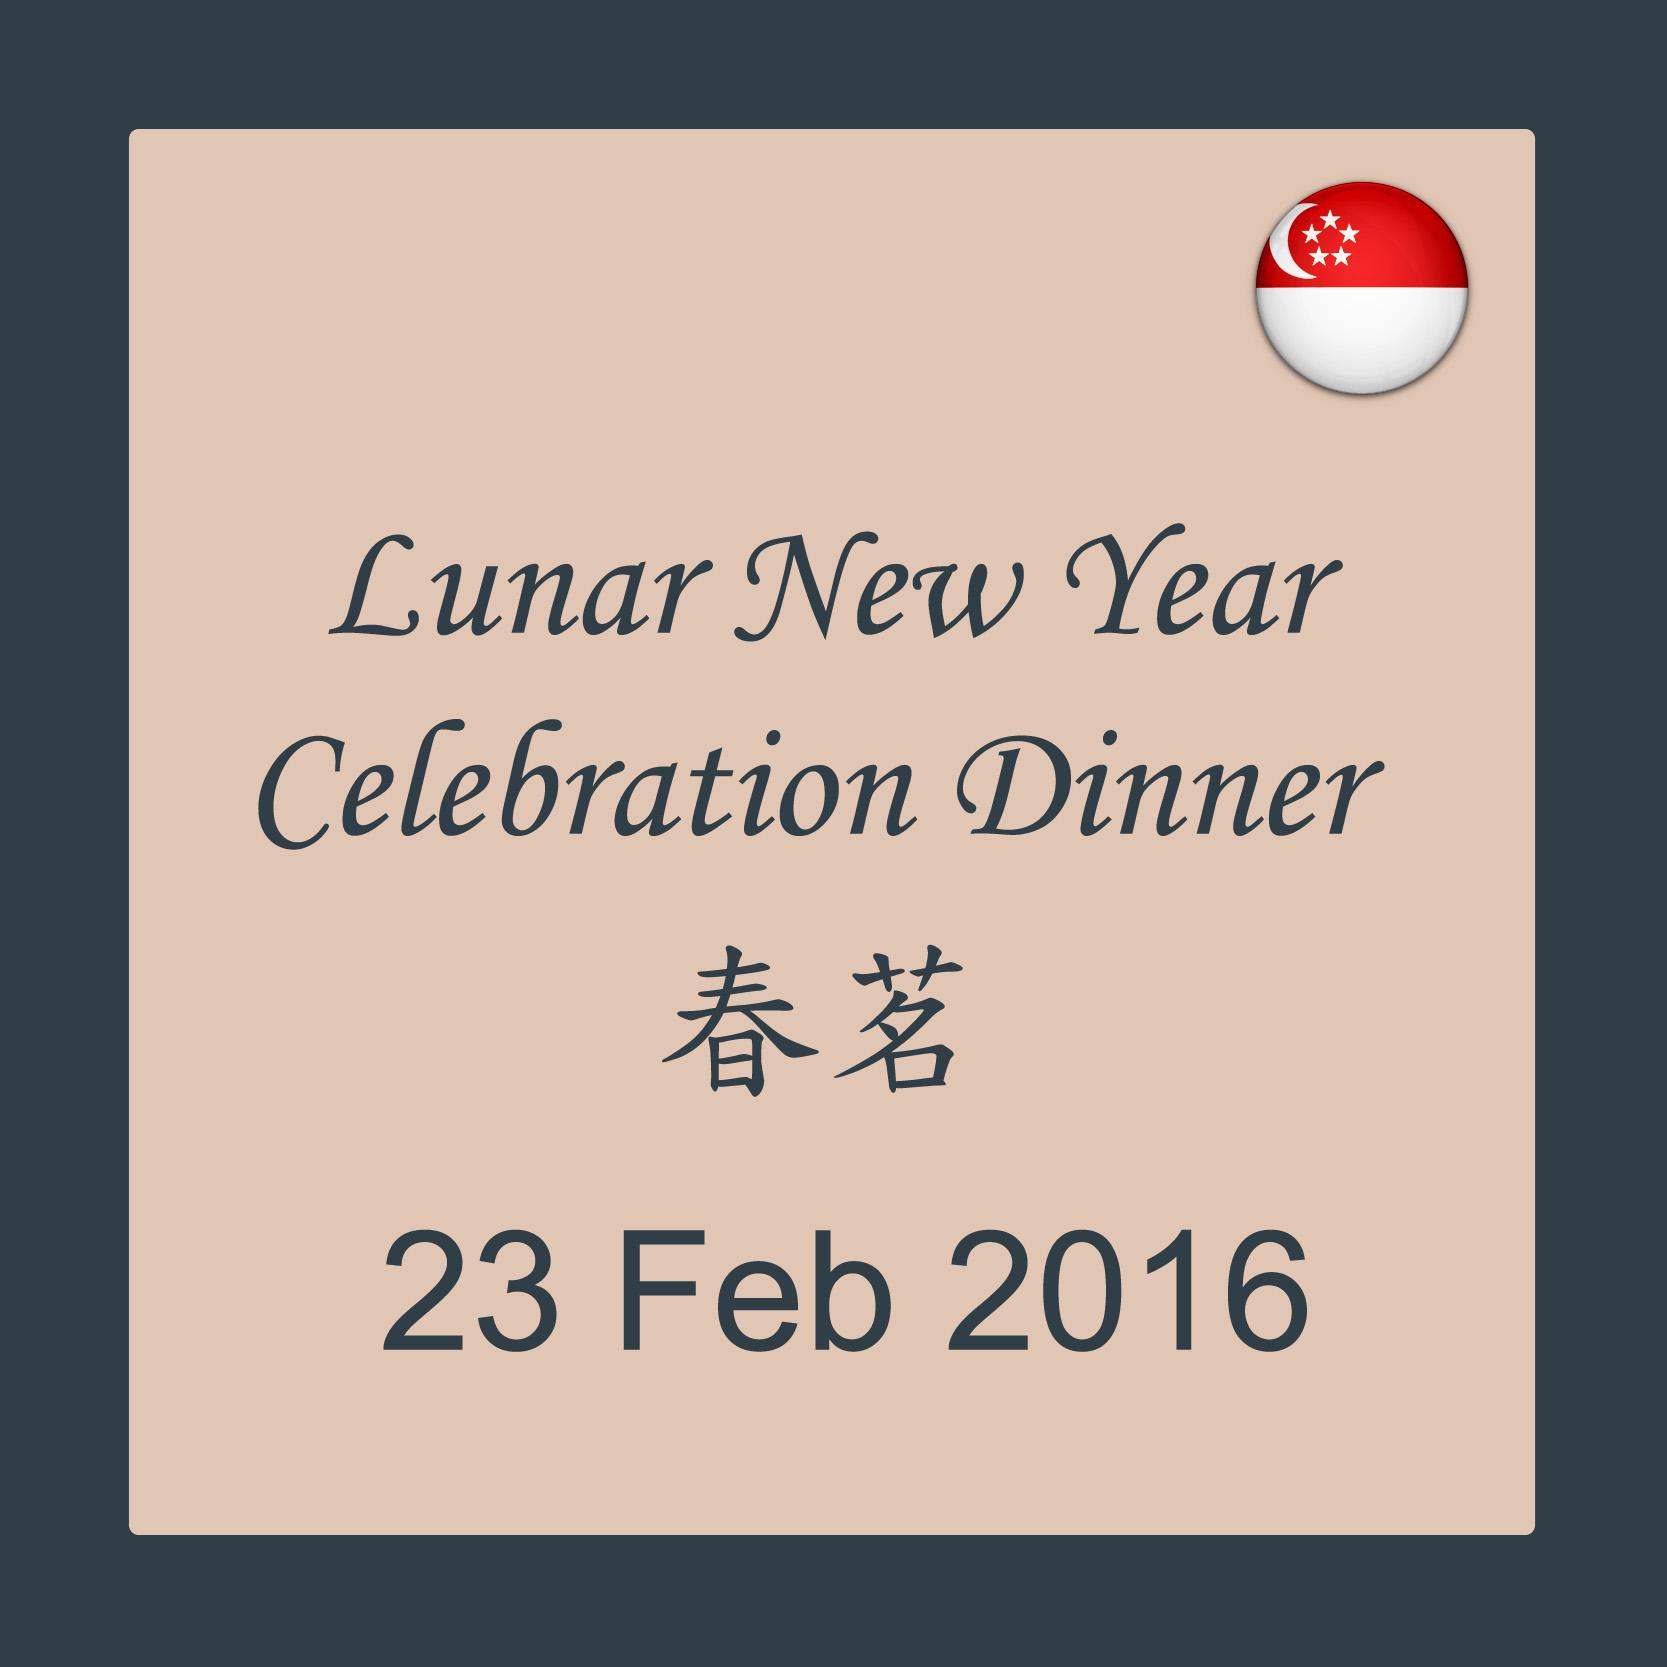 Feb 23 - Lunar New Year Celebration Dinner @ Singapore